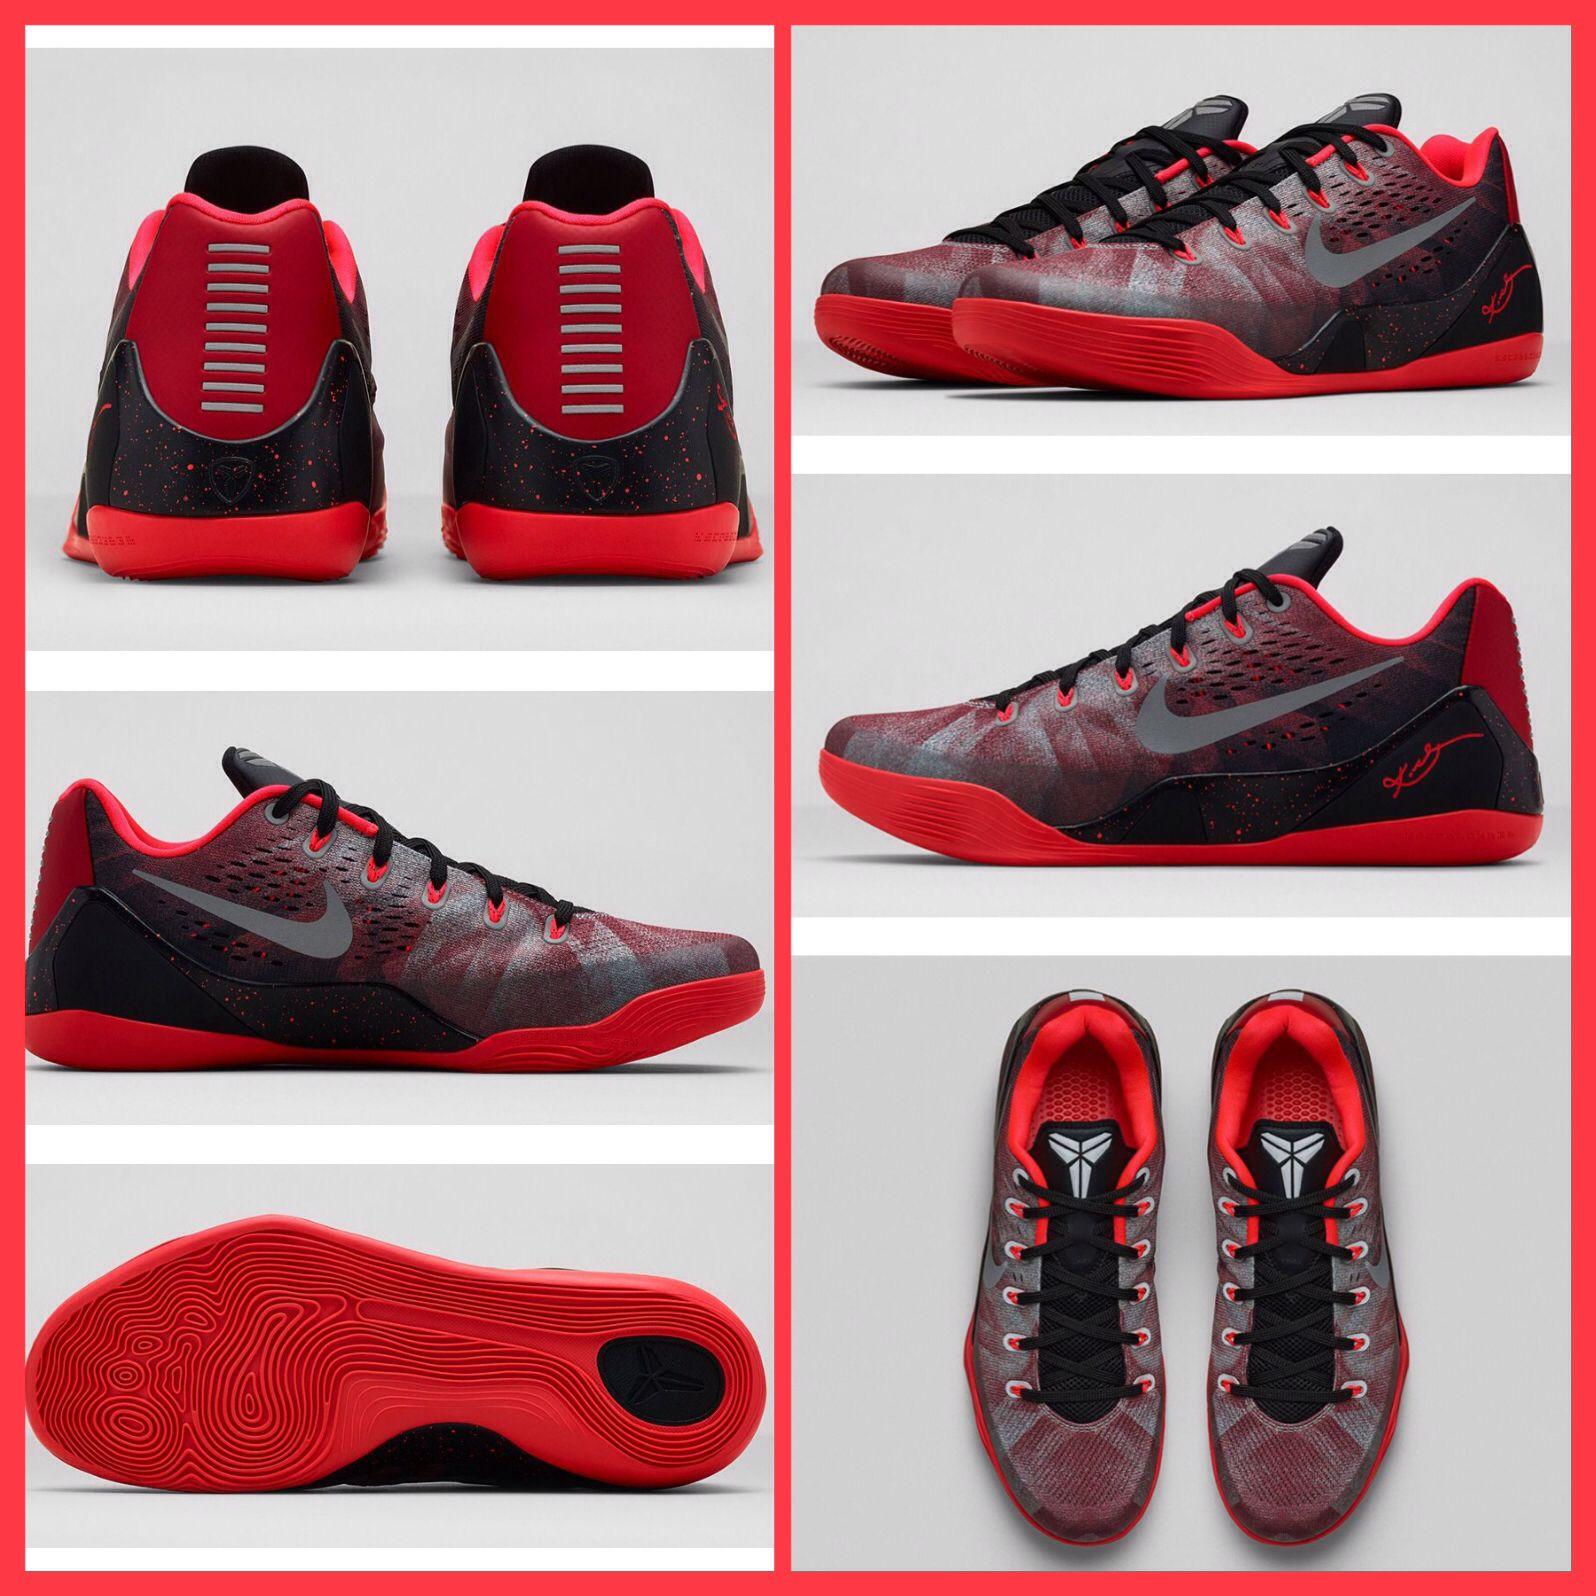 brand new e82a3 60d35 Kobe 9 Premium 652908-606 Gym Red Metallic Silver-Bright Crimson  170   Amazing  Nike  Kobe9  PremiumCollection